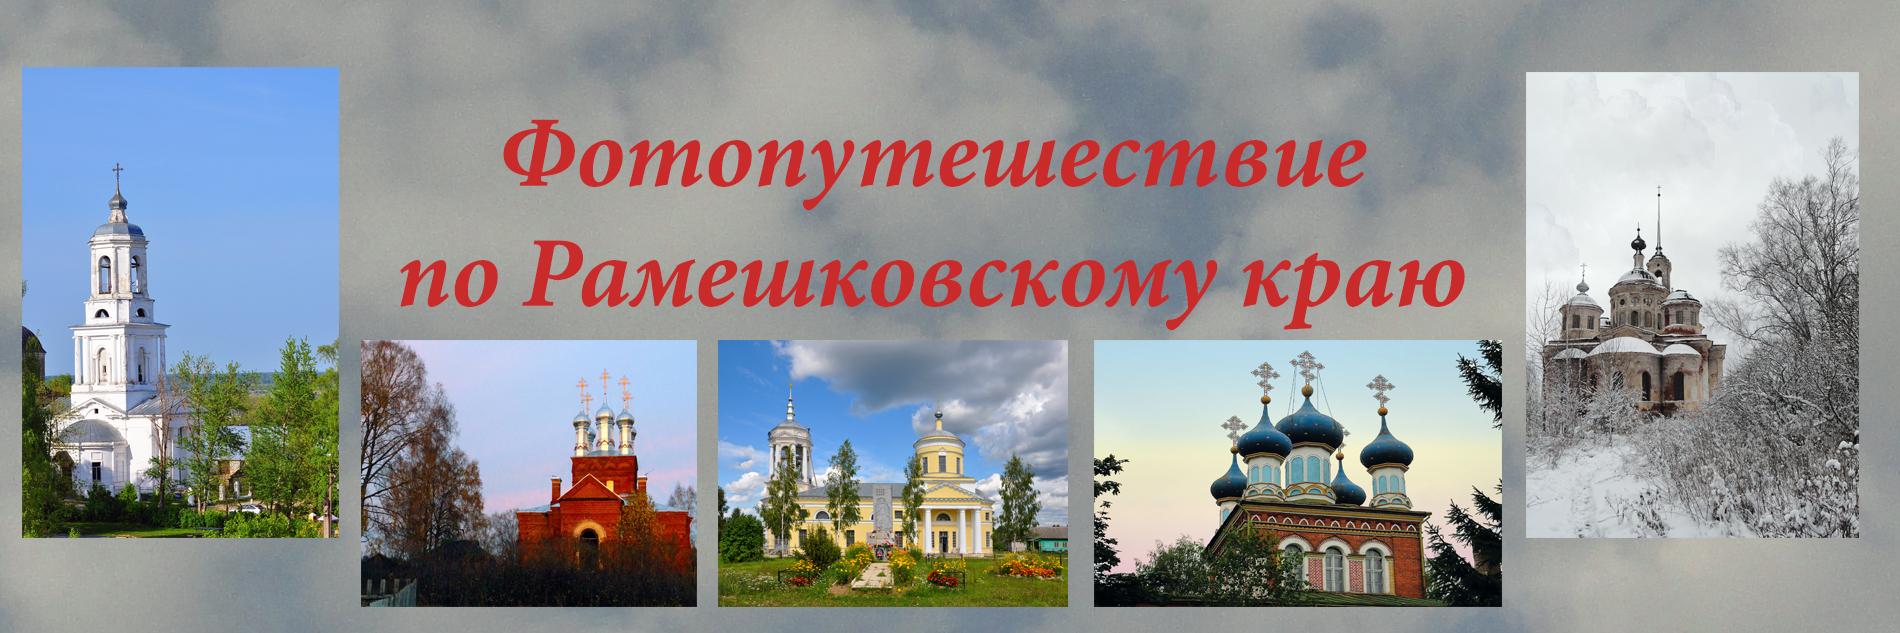 Untitled-1рпоп